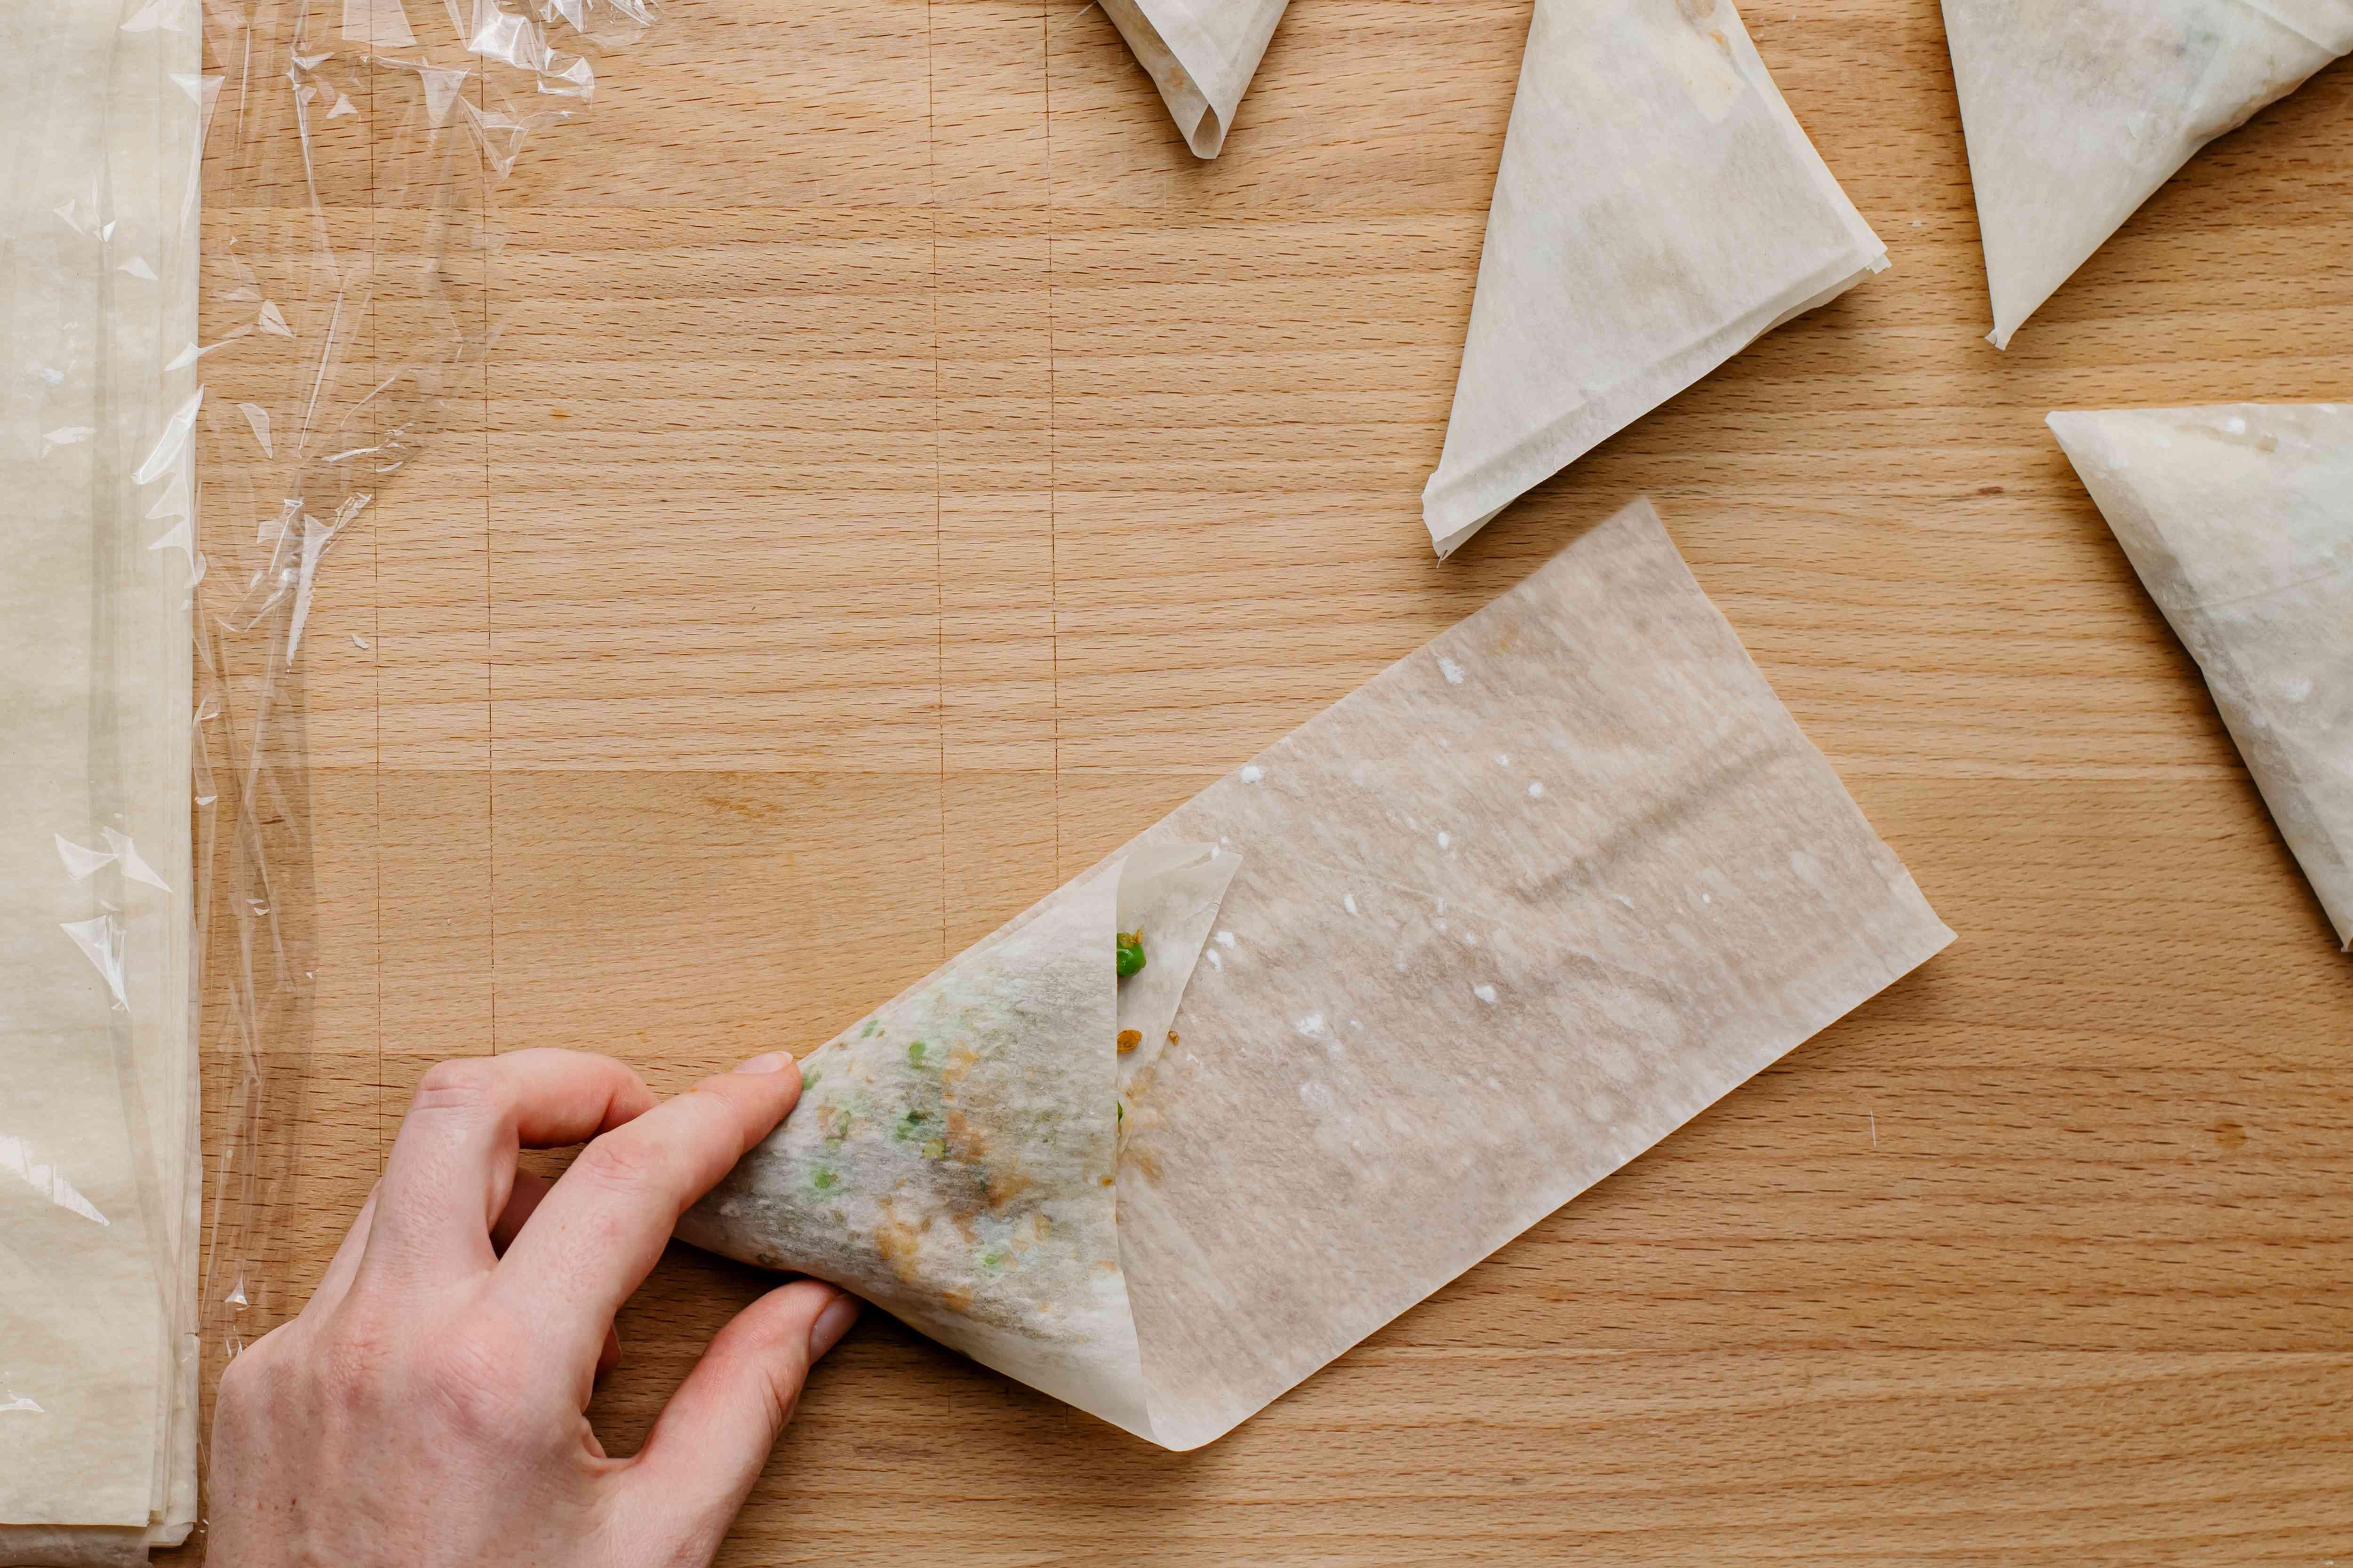 wrap the potato and pea mixture in phyllo dough